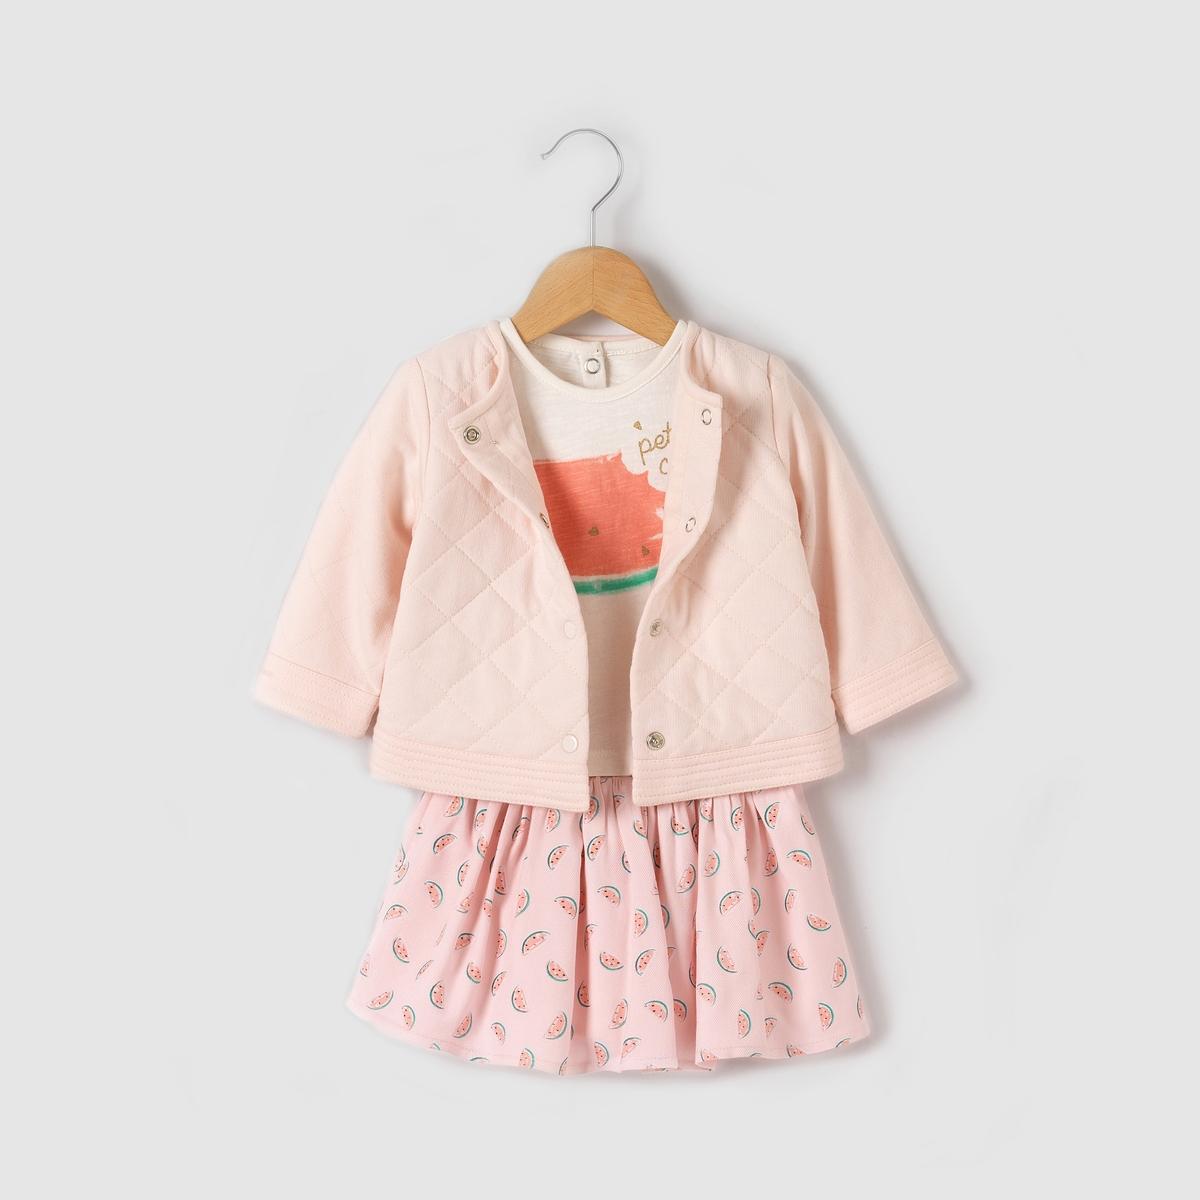 Комплект из куртки, футболки и юбки, 1 мес. - 3 года